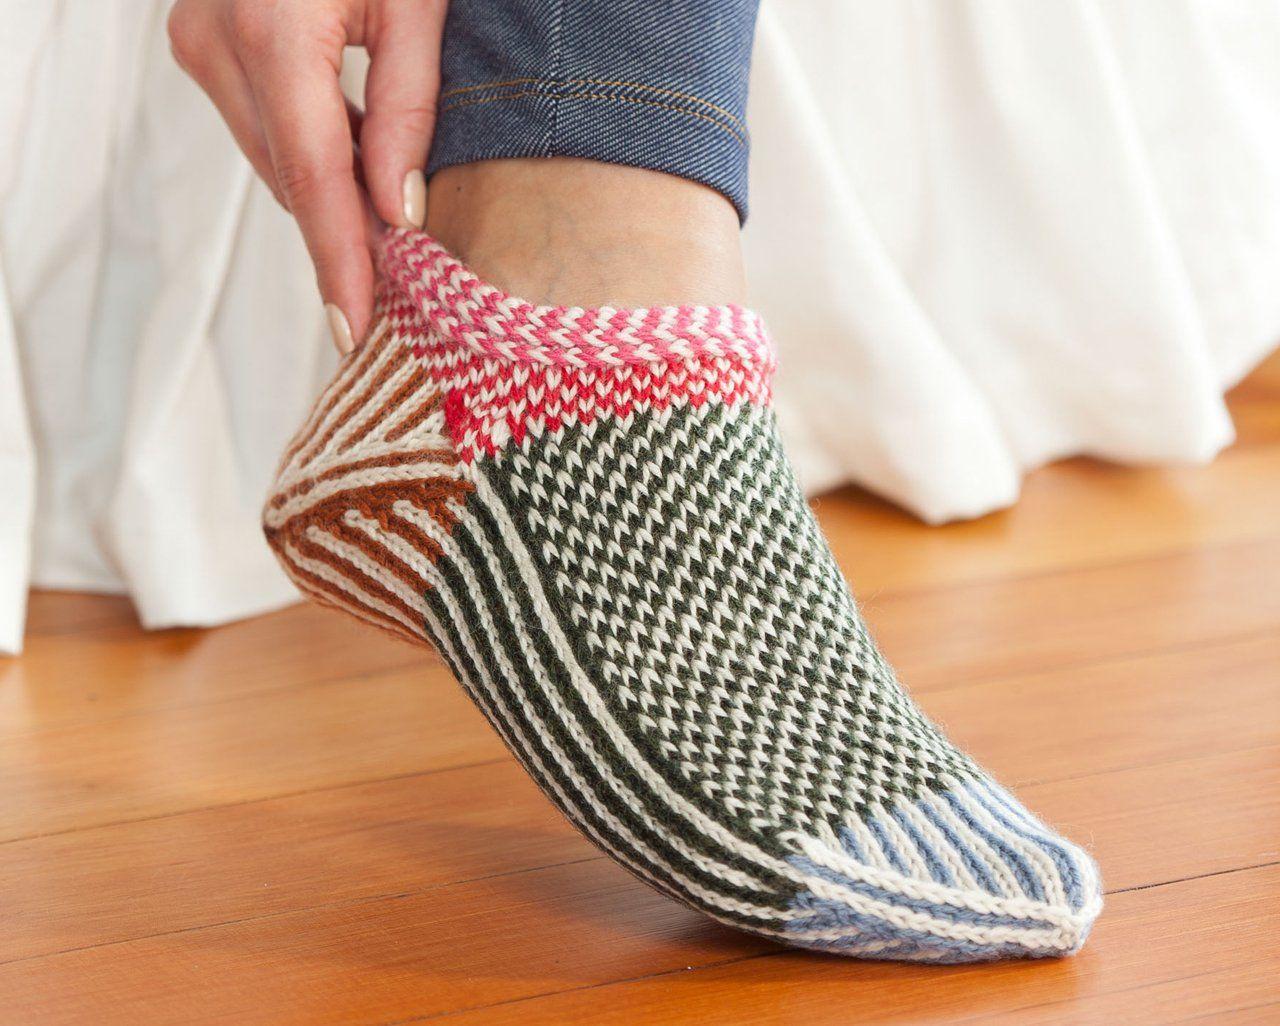 Knitting scandinavian slippers and socks laura farson ravelry basic slipper pattern pattern by laura farson bankloansurffo Gallery